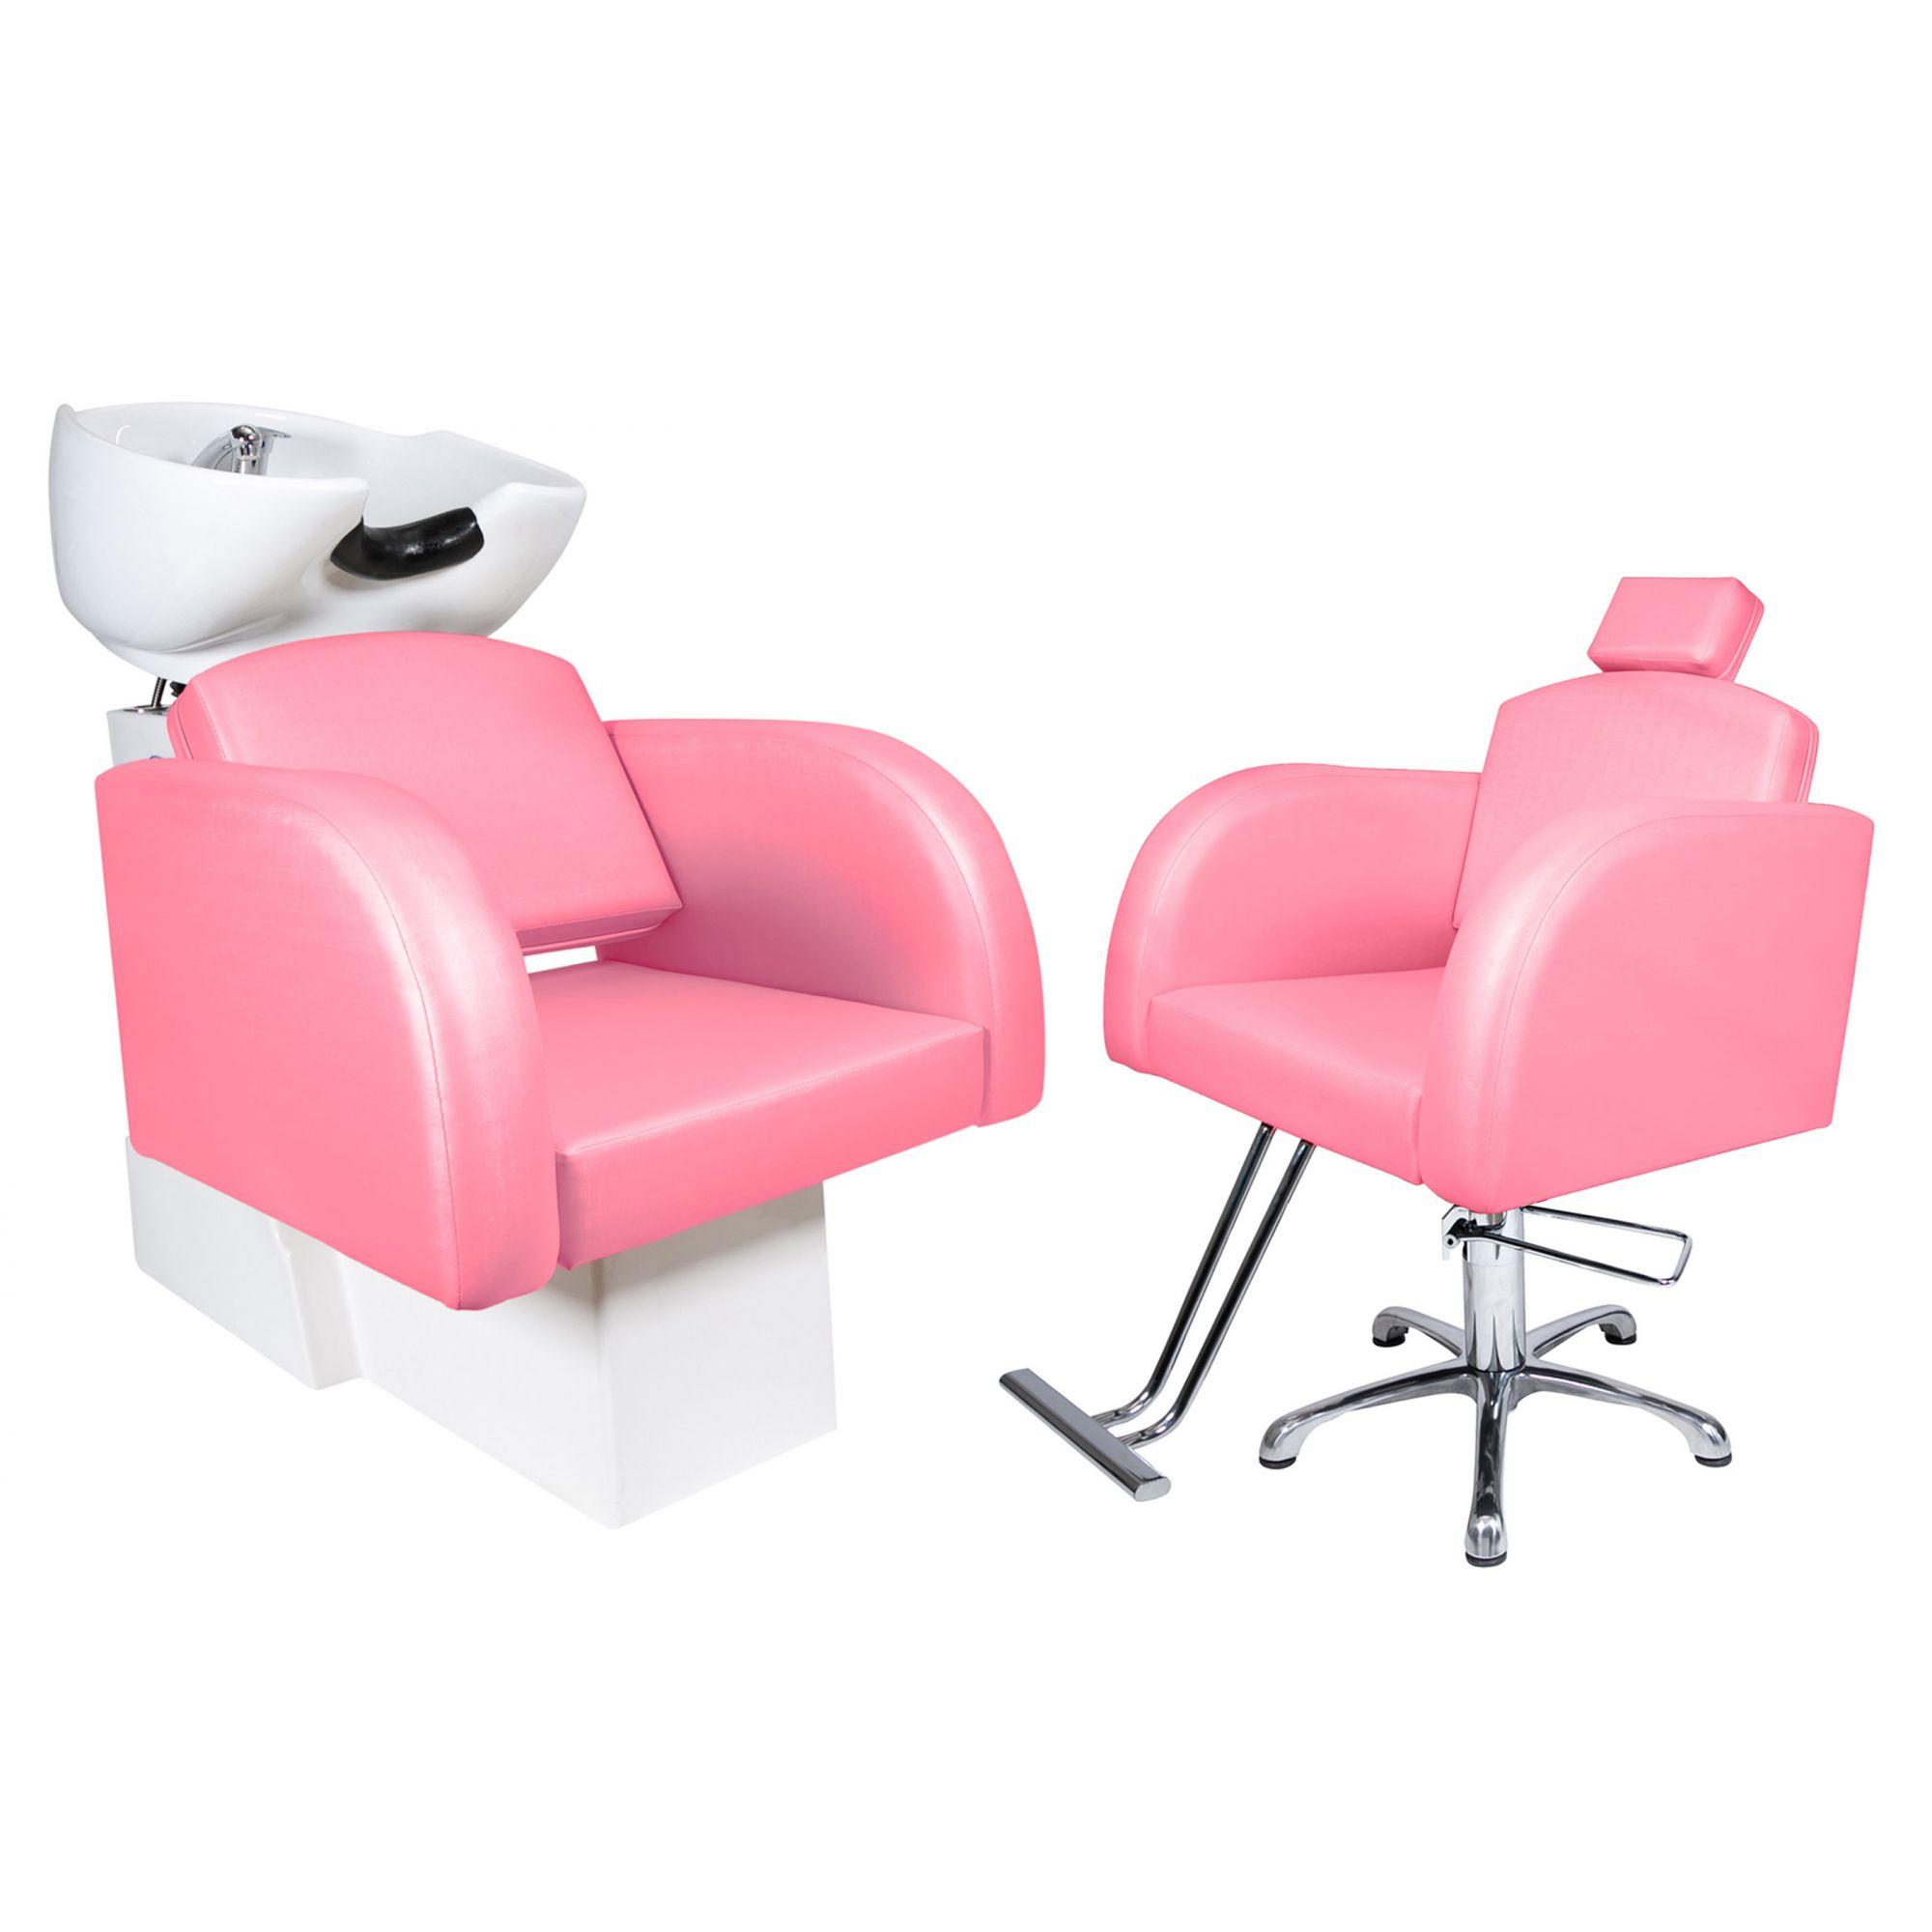 Destak Rosa - Lavatorio + Cadeira Hidráulica Fixa